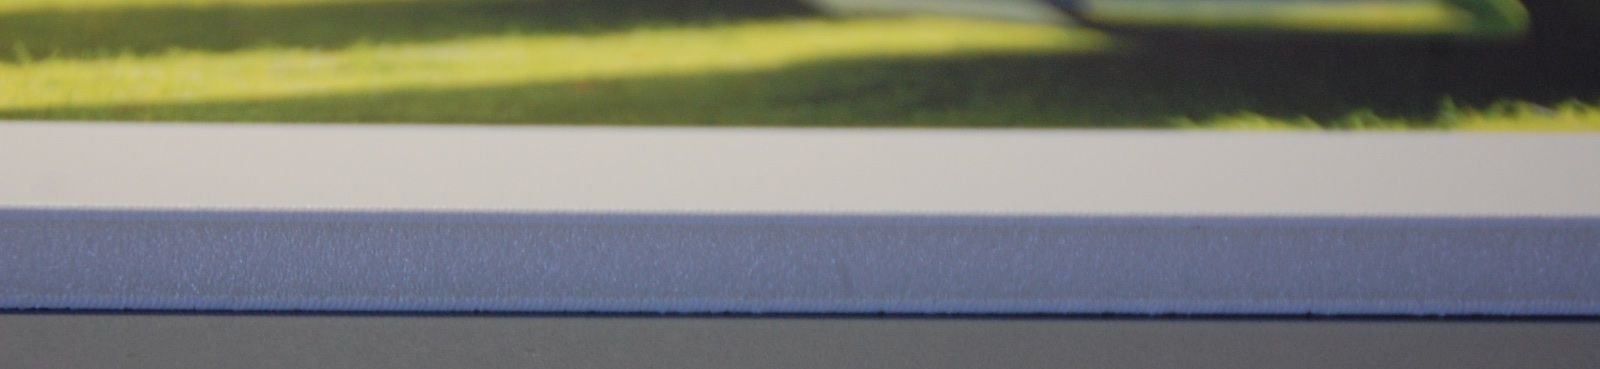 Stampa su pannello communication 10mm